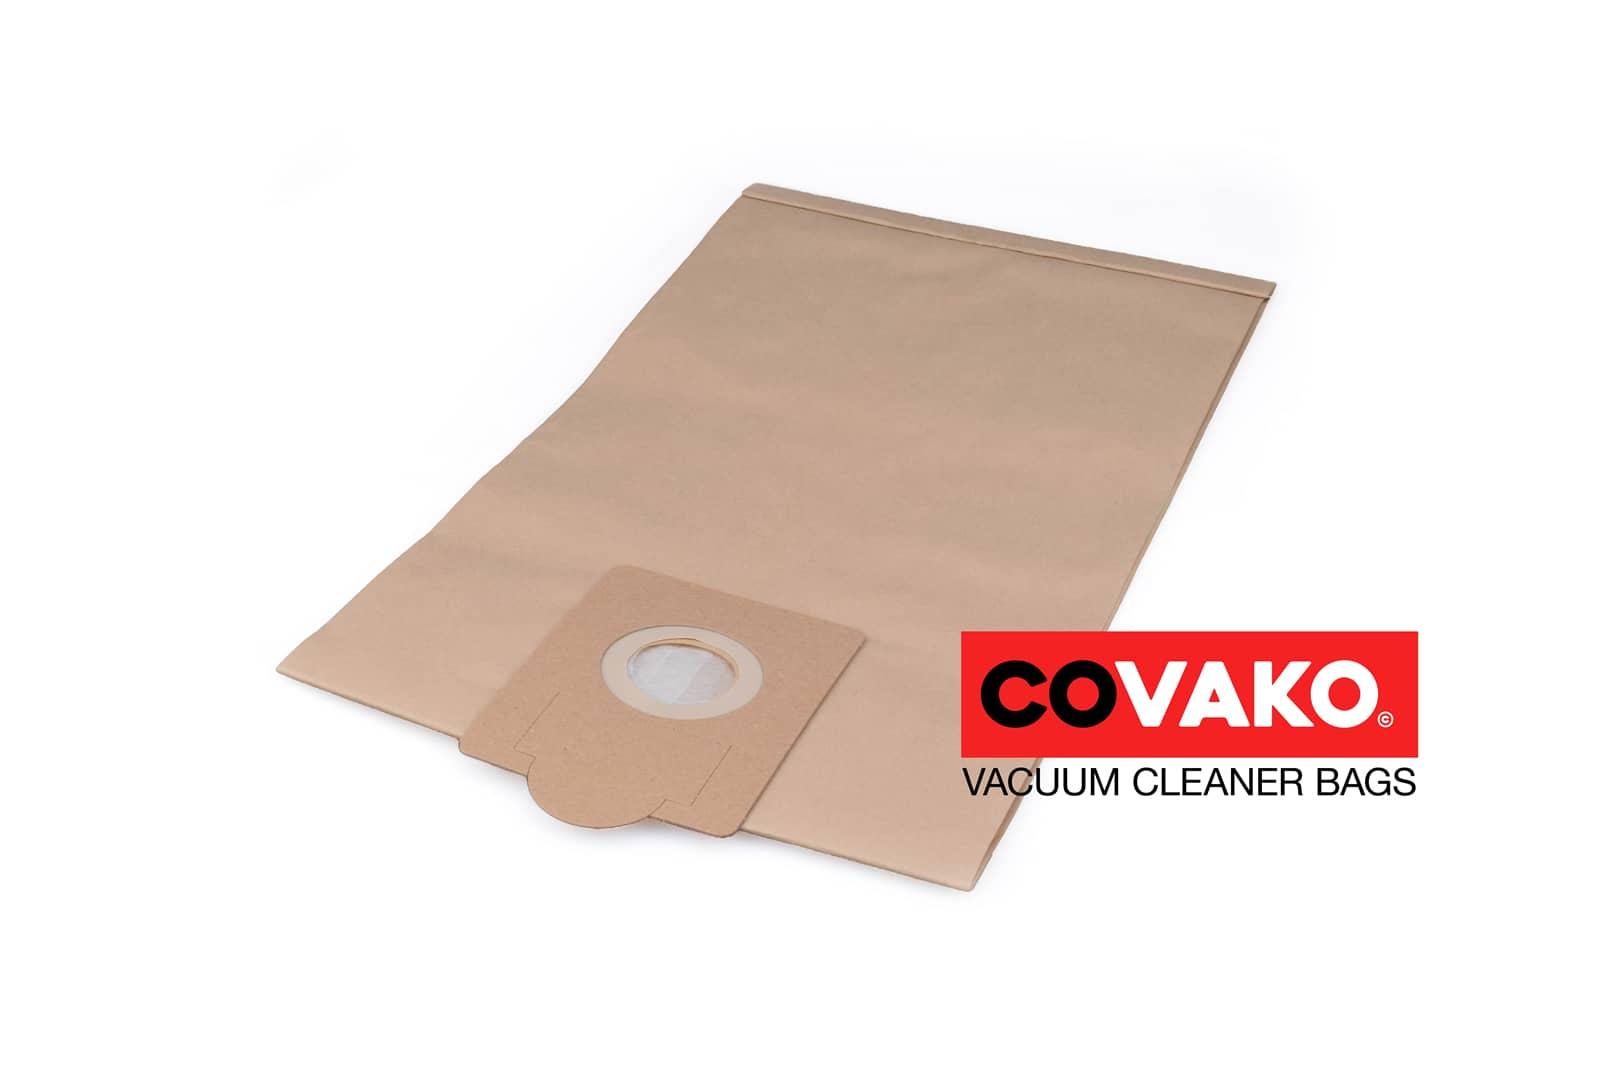 Hawig TS 8 / Papier - Hawig sacs d'aspirateur